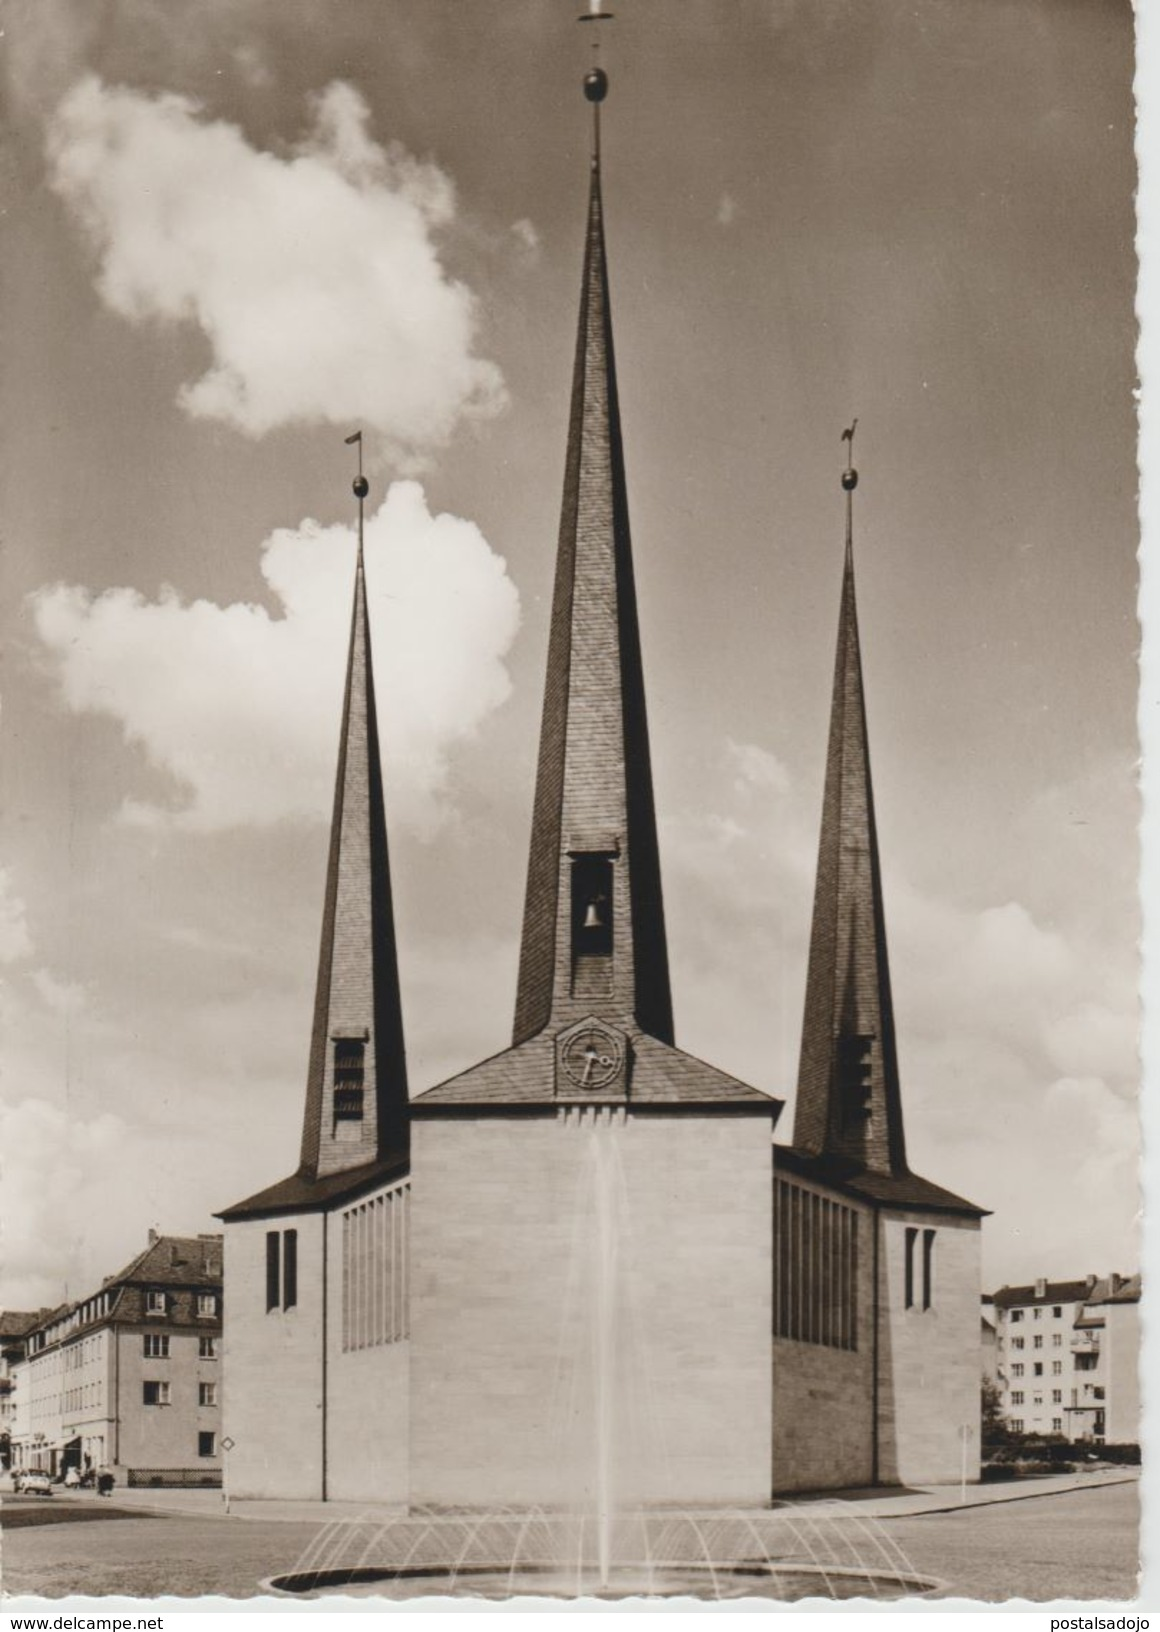 (DE1484) BAYREUTH. EVANG. LUTH CHRISTUSKIRCHEN - Bayreuth